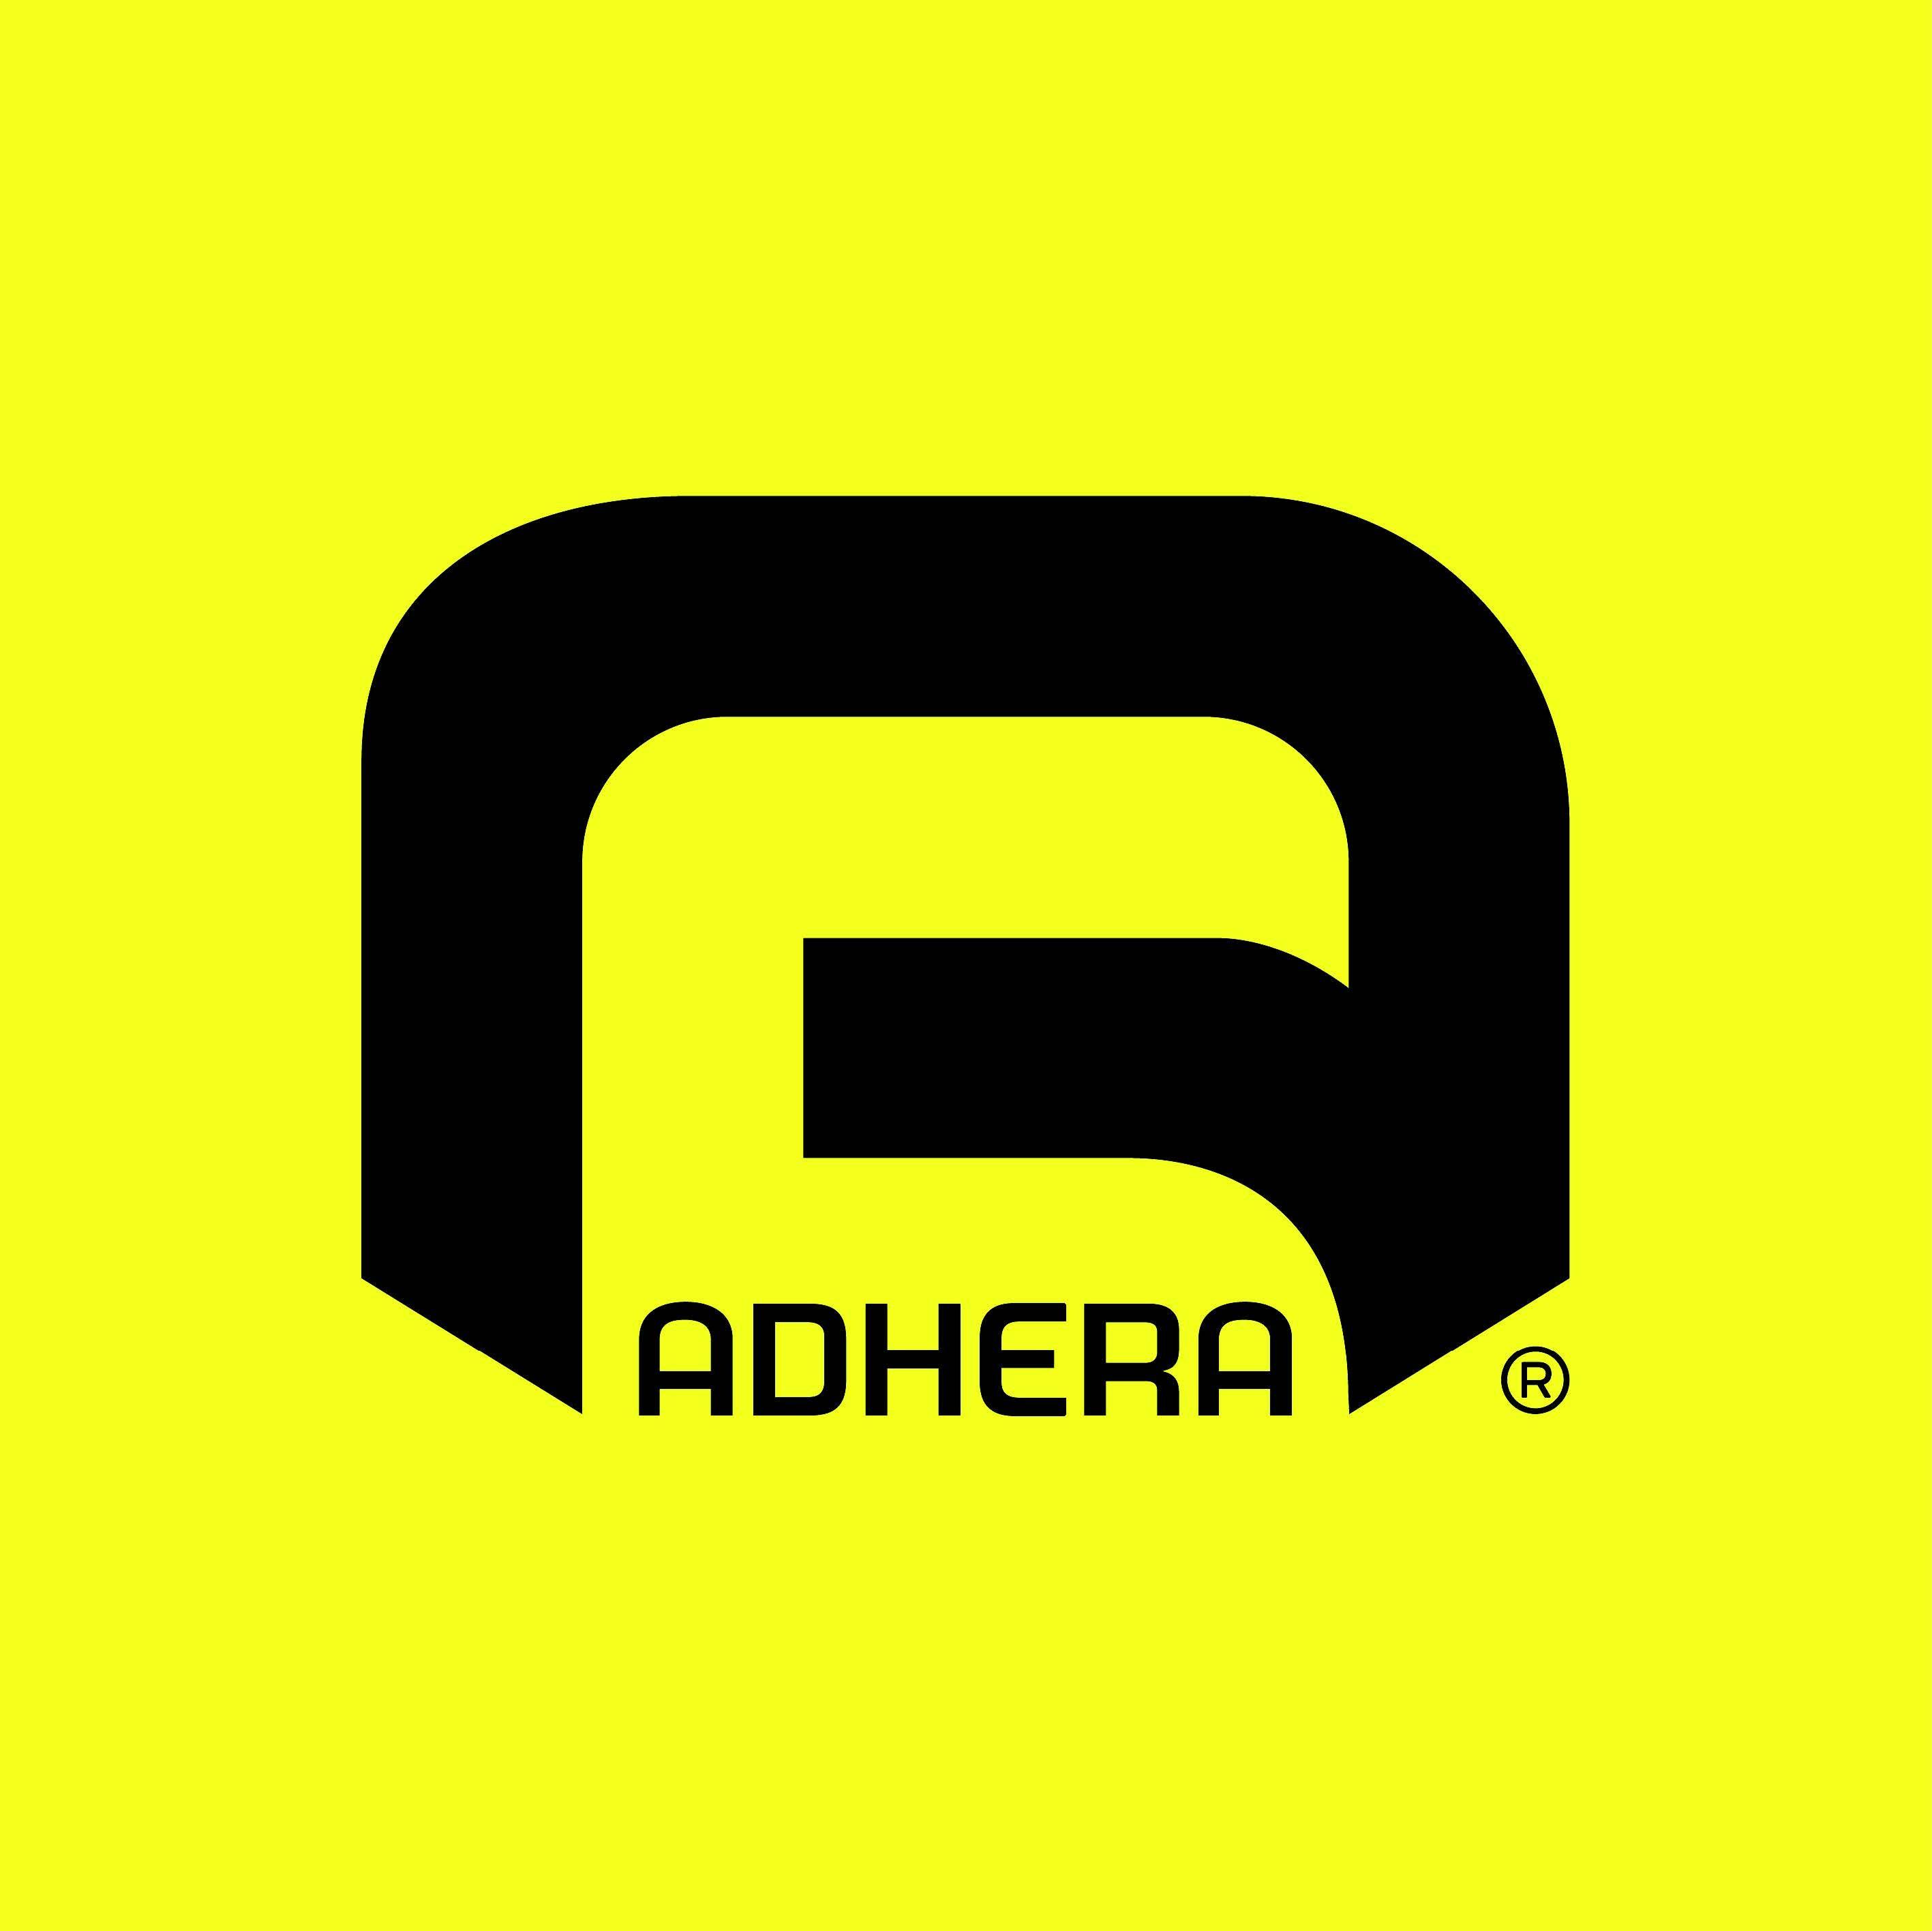 Adhera